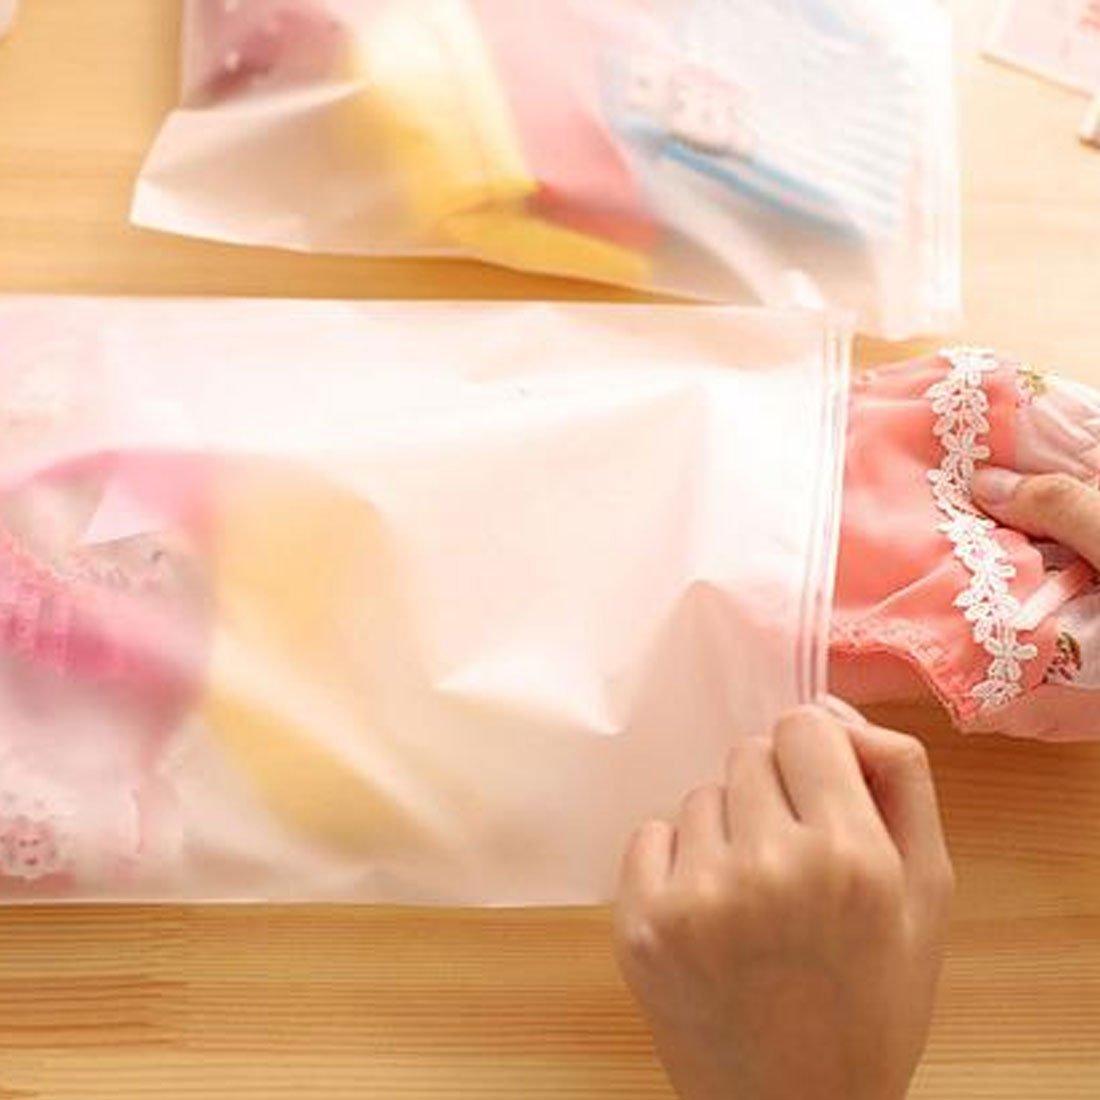 Amazon.com: eDealMax EVA Exterior Con cremallera ropa que embala organizador de viajes Bolsa de almacenamiento DE 35 x 25cm 10pcs Blanco claro: Home & ...